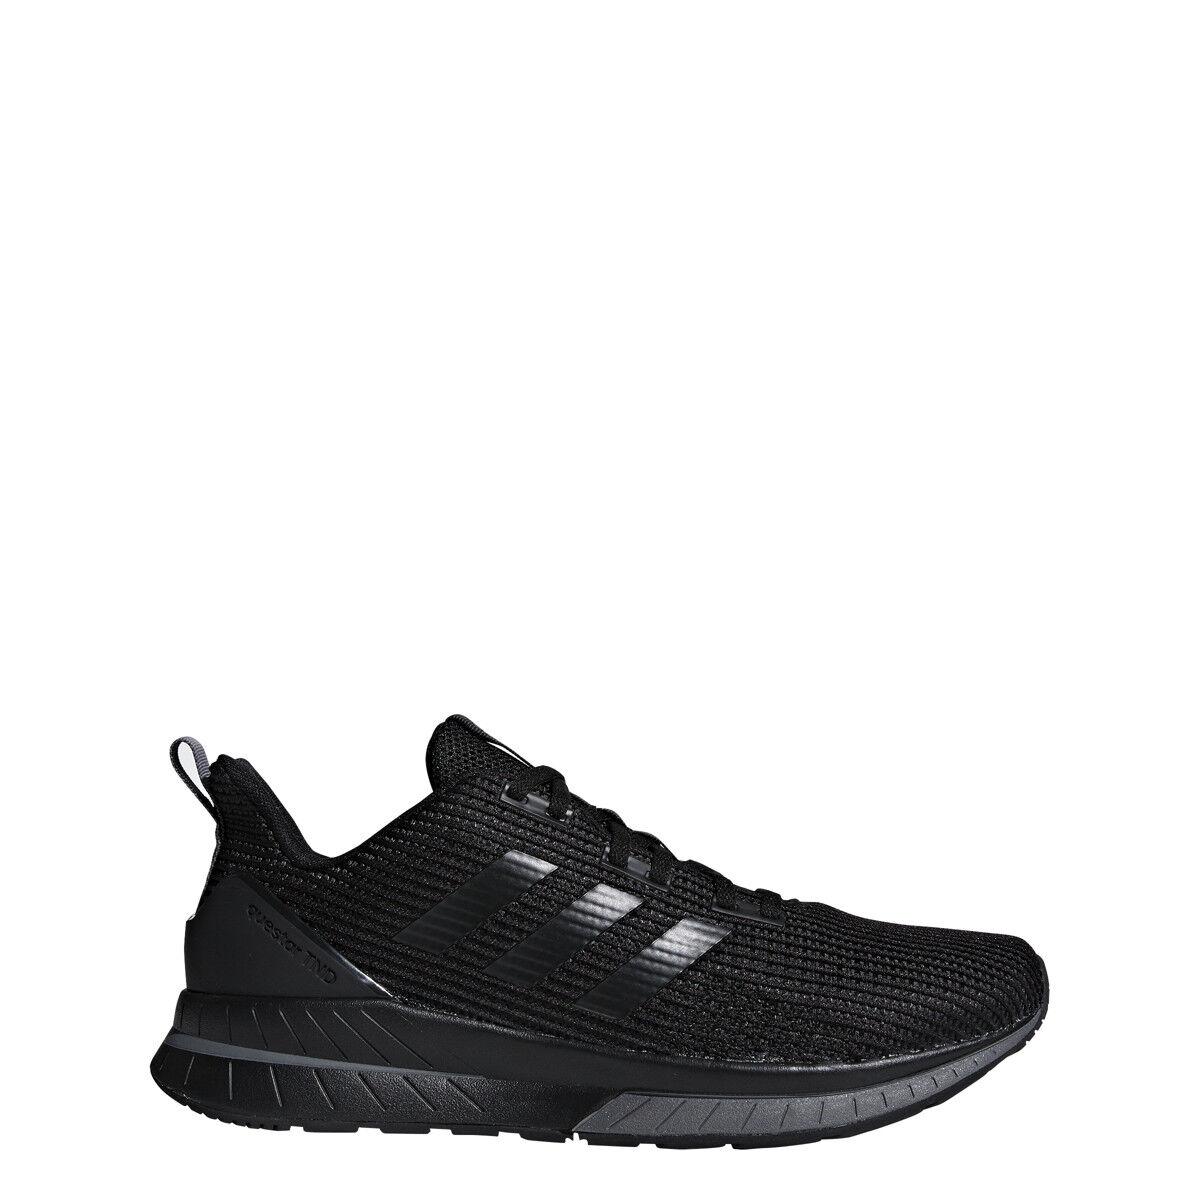 Mens Adidas Questar TND Black Athletic Running Sport shoes B44799 Sizes 10-12